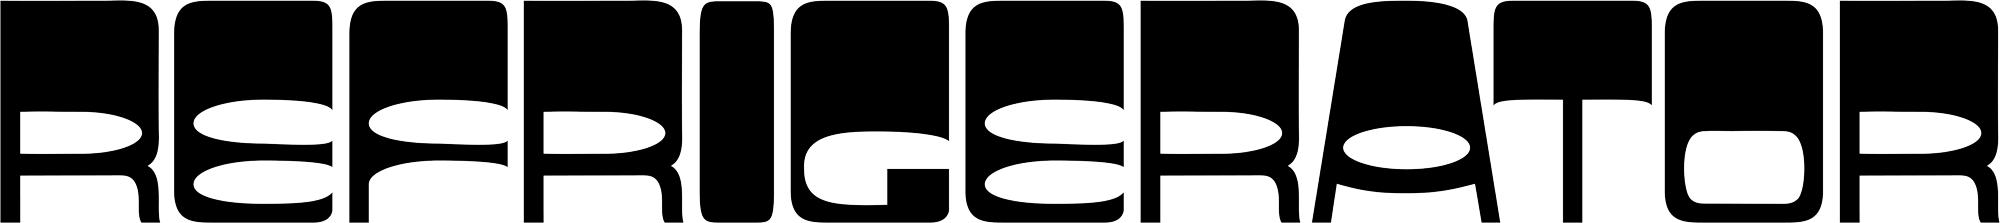 Refrigerator logo on white